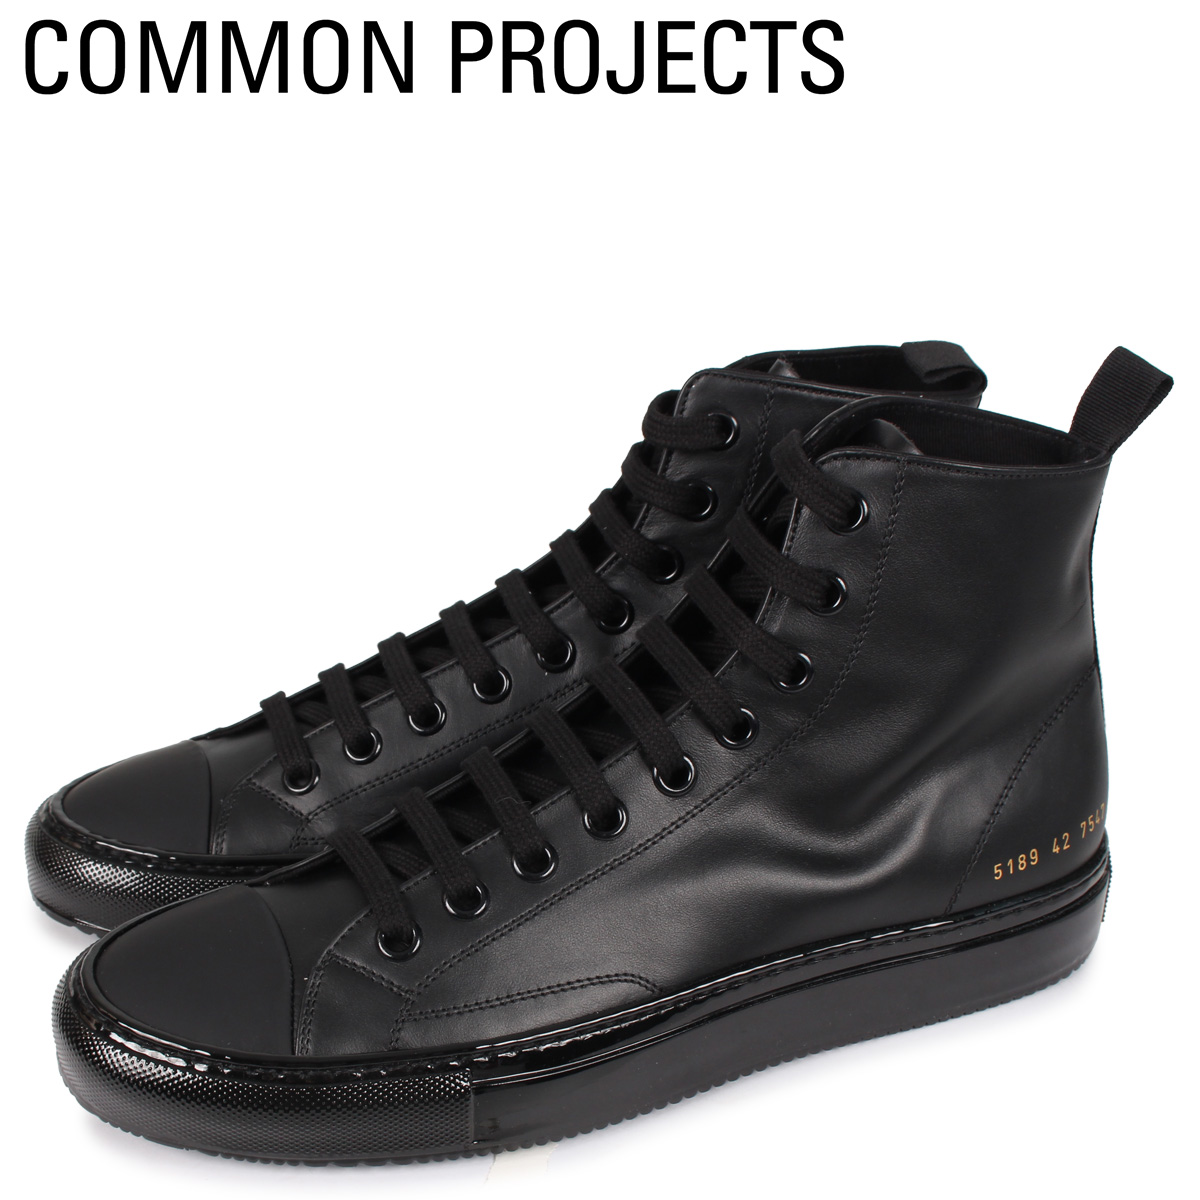 Common Projects コモンプロジェクト トーナメント ハイ スニーカー メンズ TOURNAMENT HIGH IN LEATHER ブラック 黒 5189-7547 [4/2新入荷]